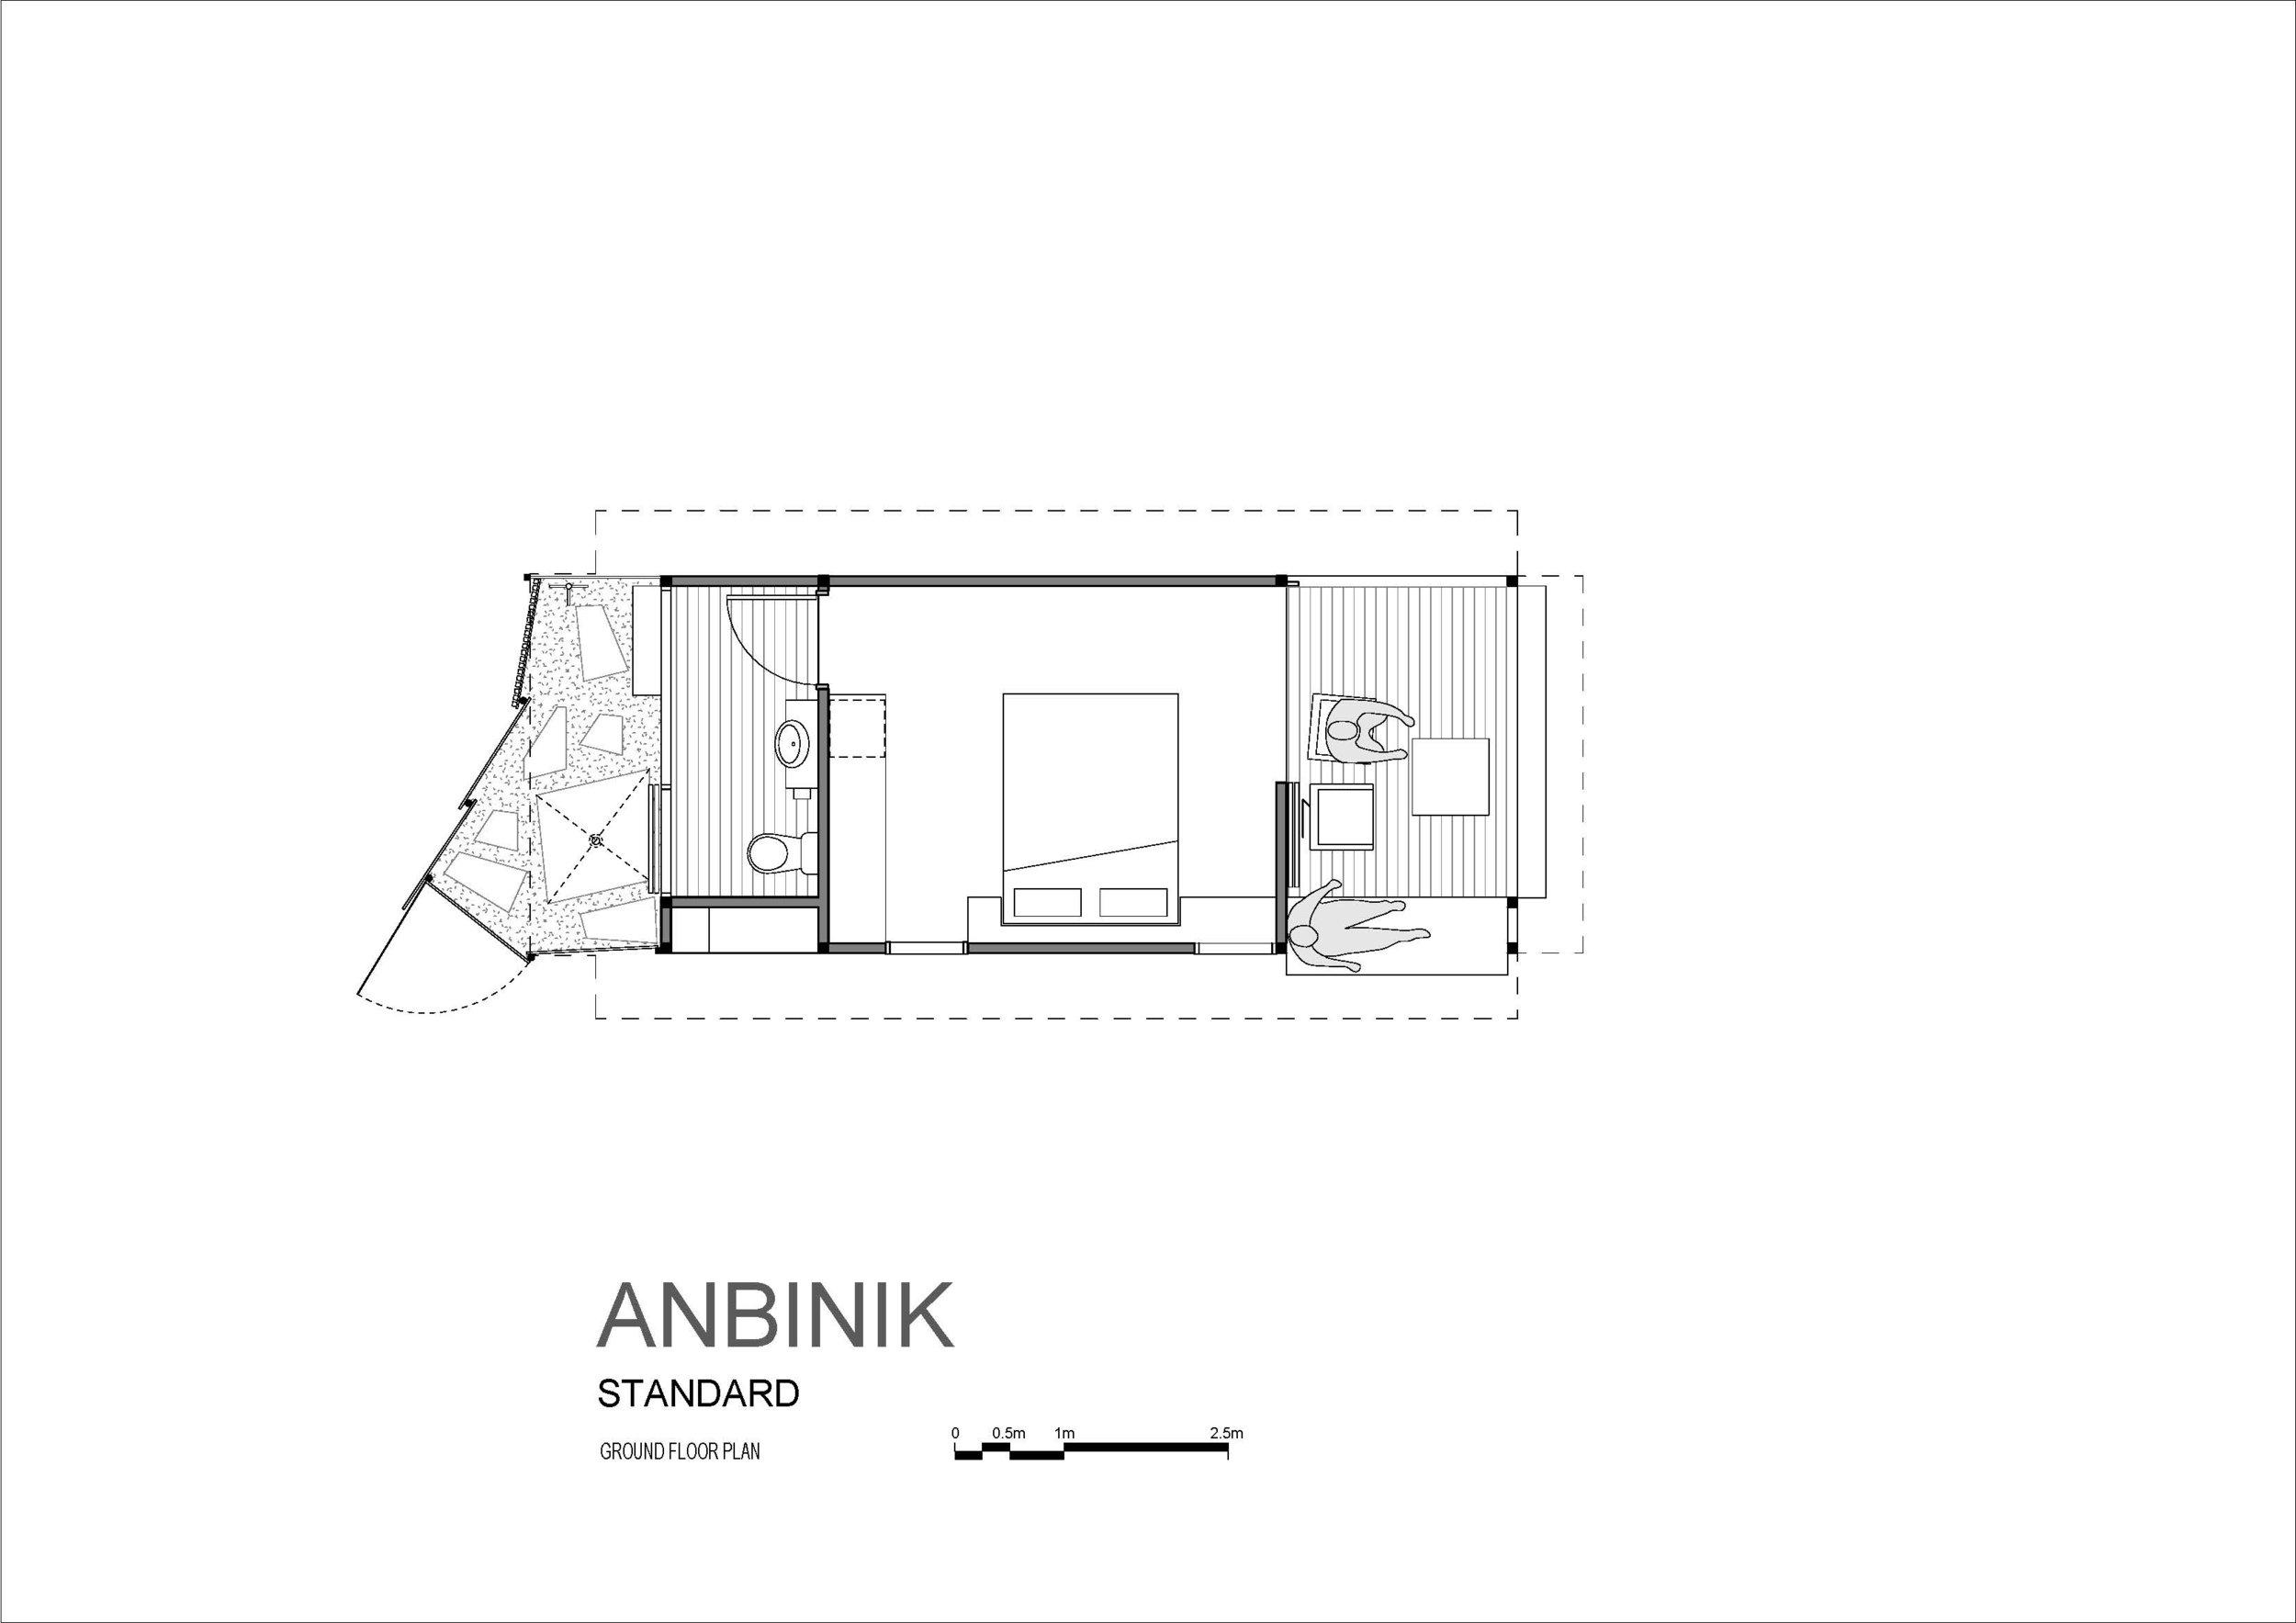 ANBINIK BUNGALOW_Standard.jpg